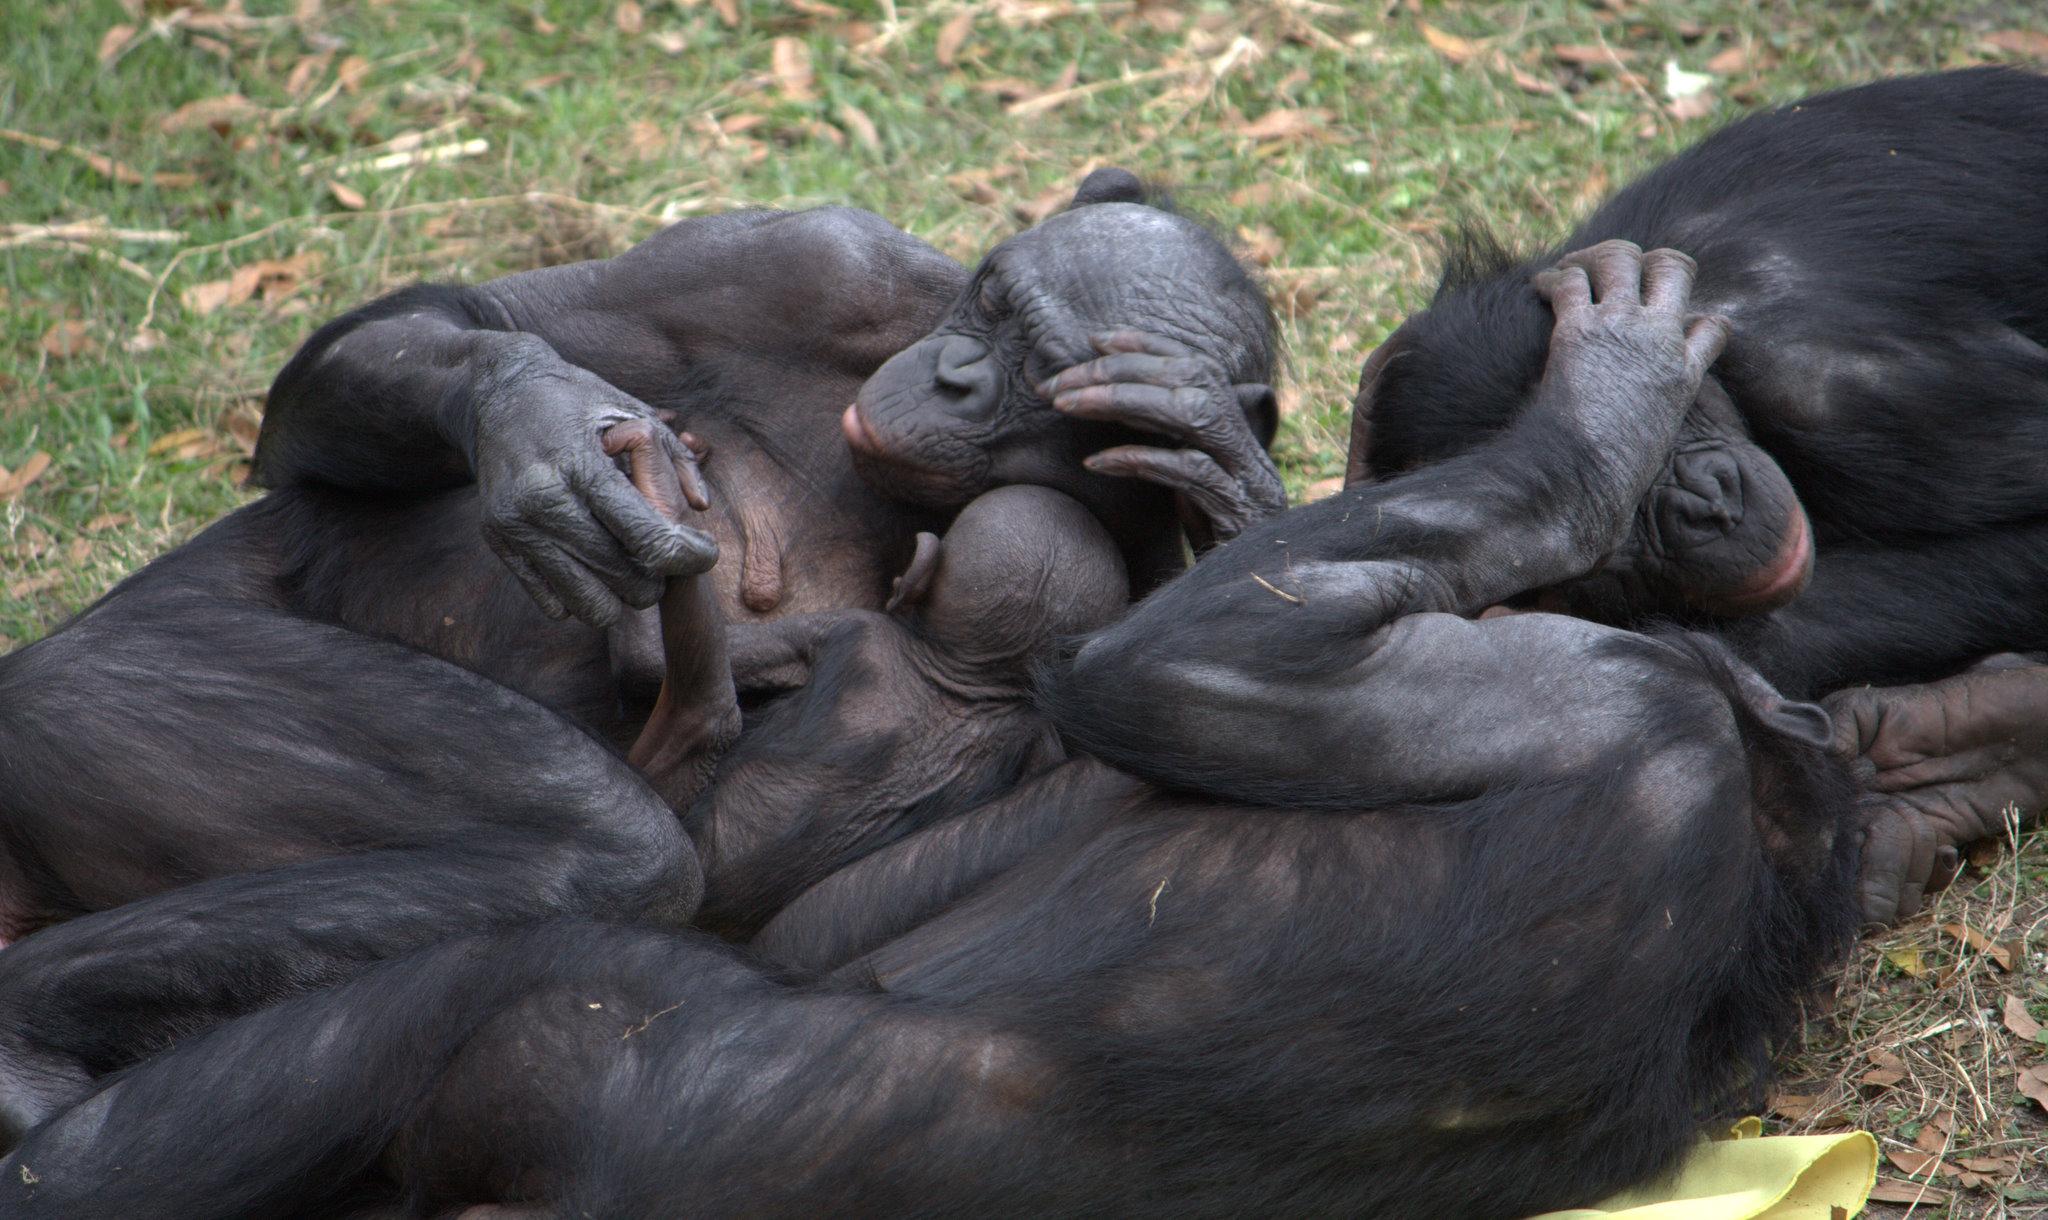 Sexual behaviours, both heterosexual and homosexual, foster social ties in bonobos.   LaggedOnUser/Flickr  (CC BY-SA 2.0)